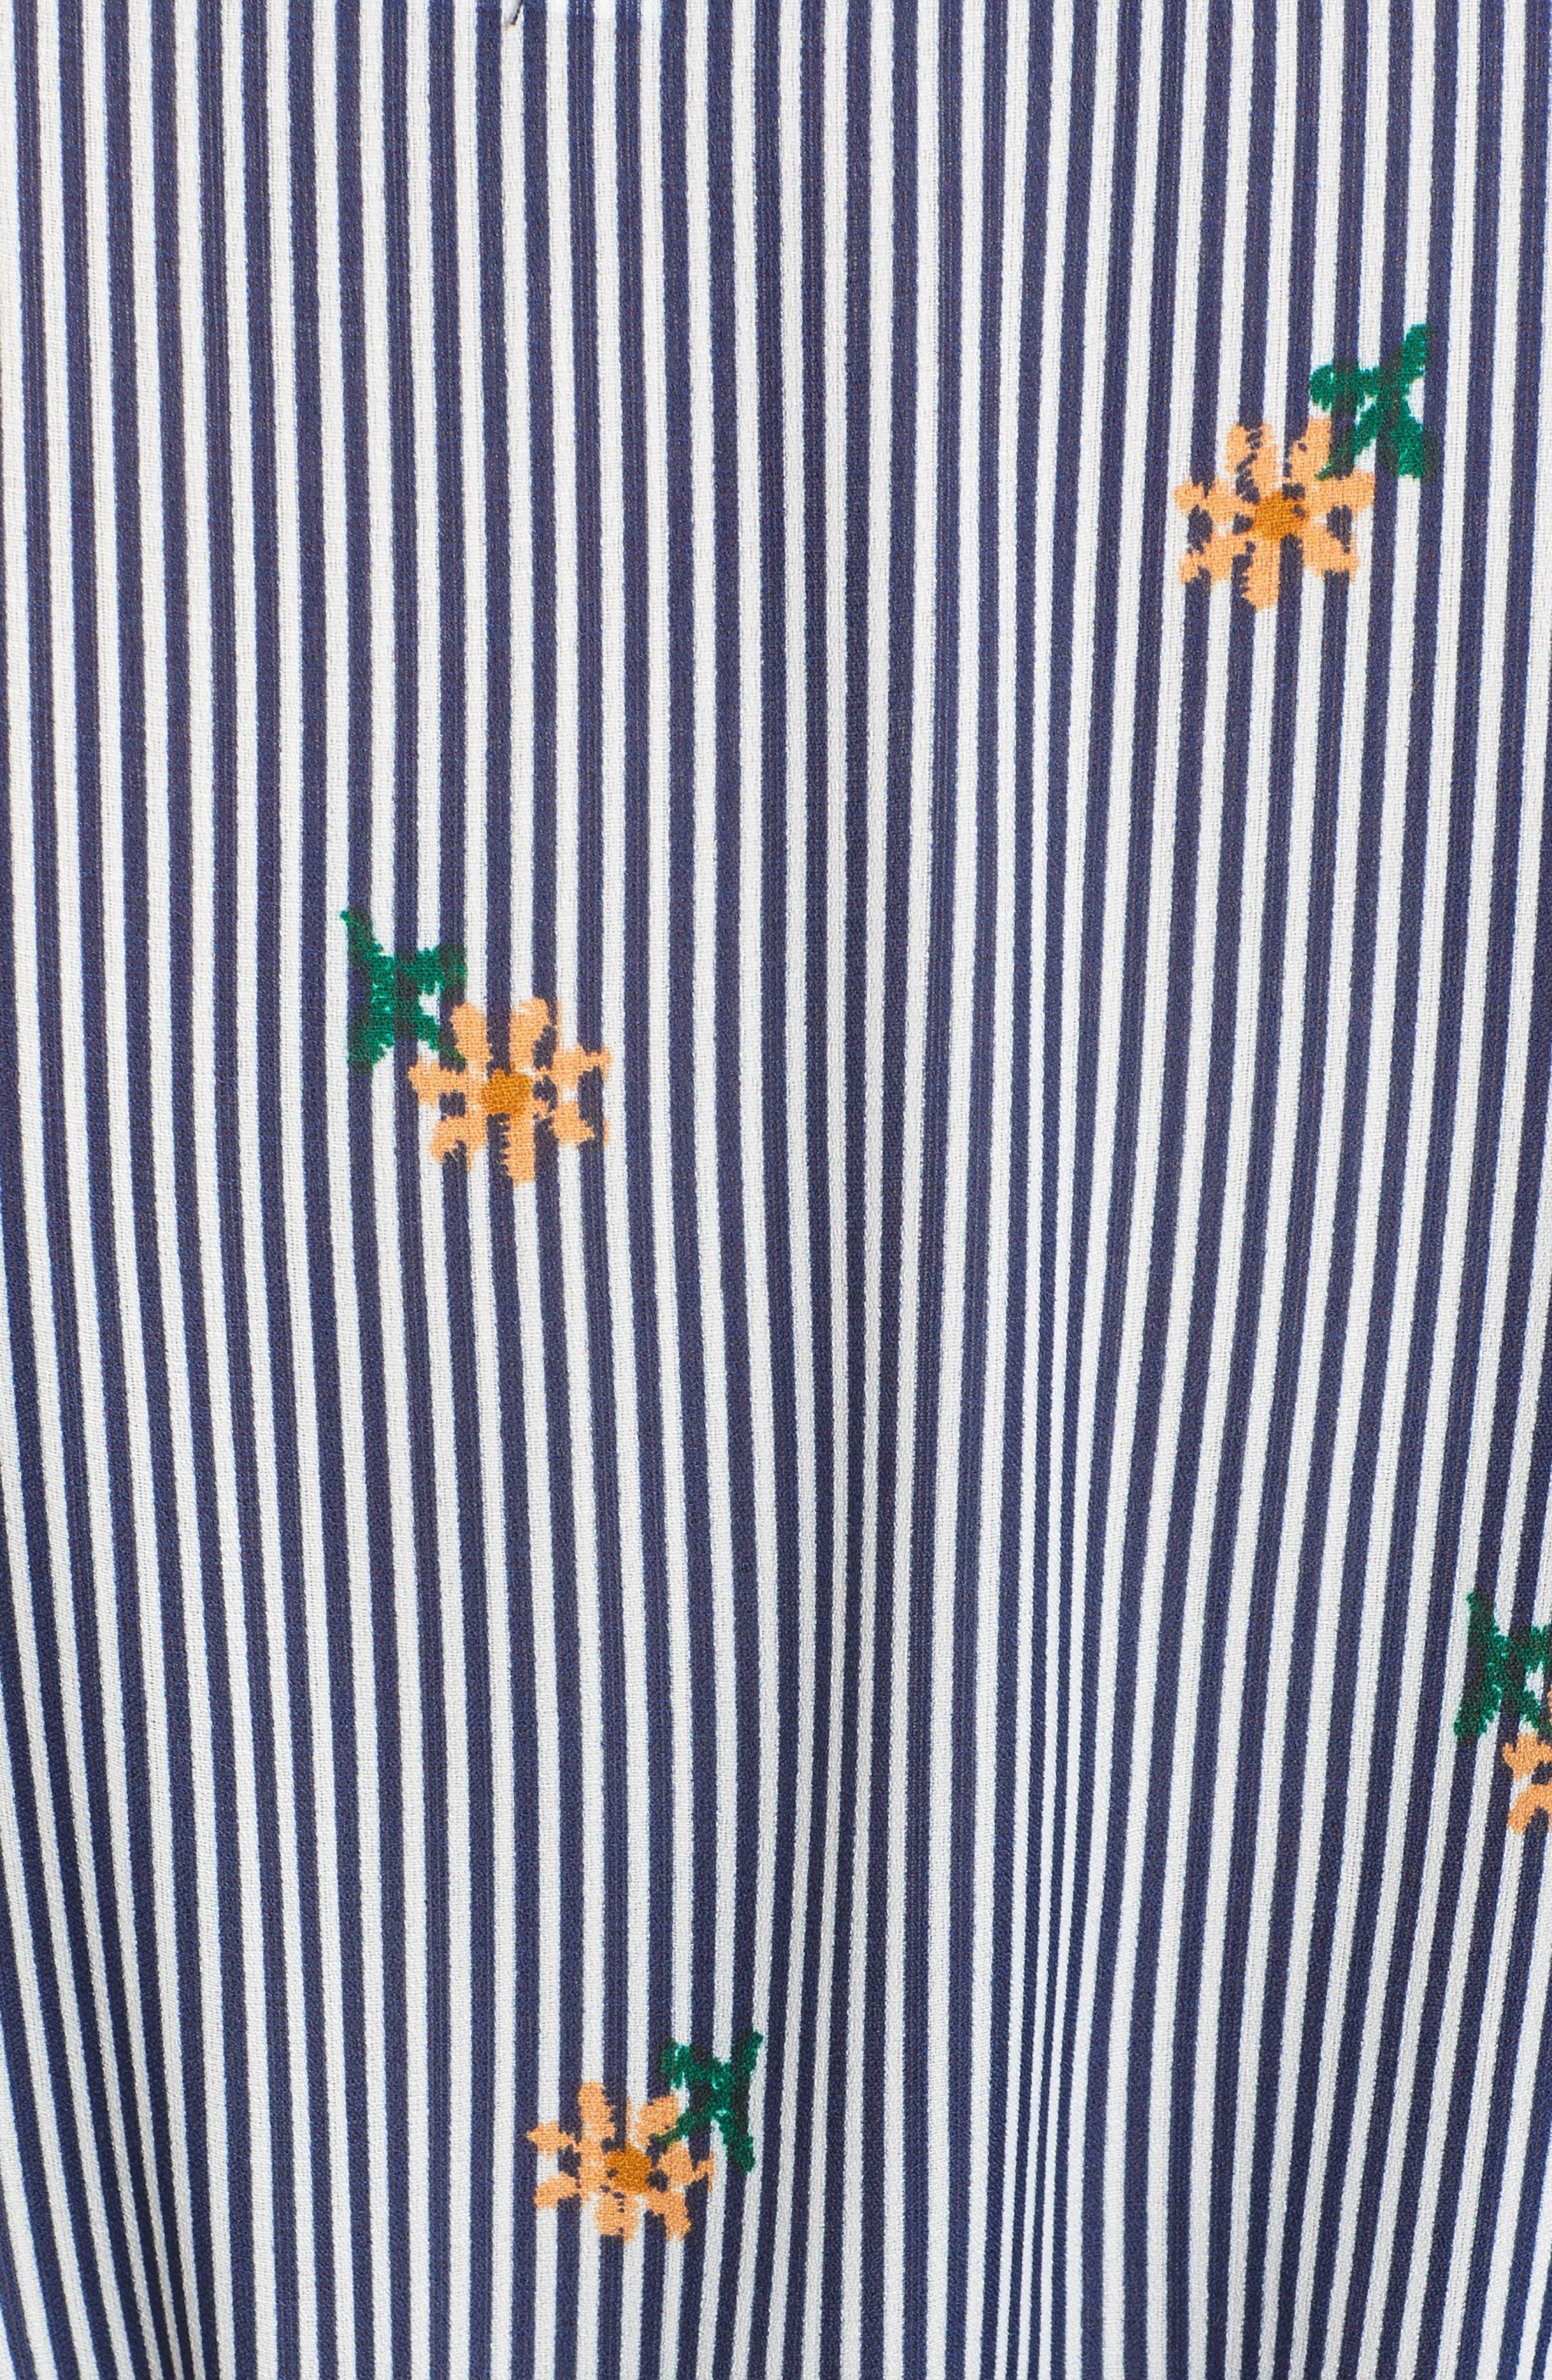 Bishop + Young Majorca Stripe Wrap Top,                             Alternate thumbnail 6, color,                             MAJORCA STRIPE